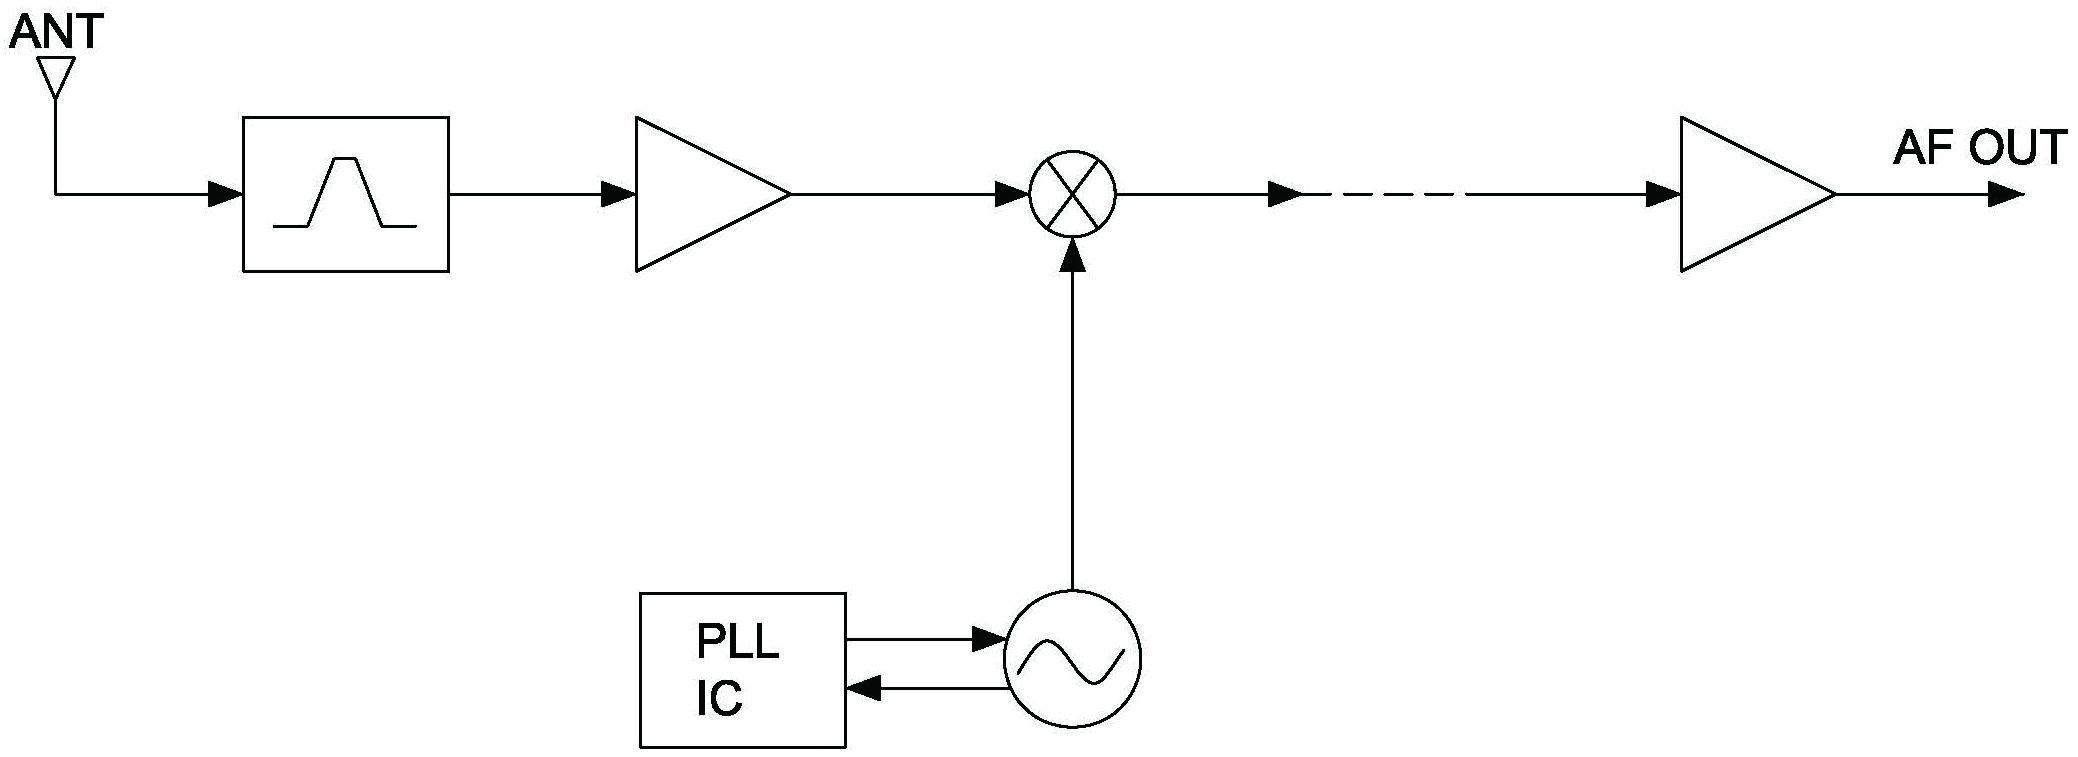 Figure 1: Non-Diversity Receiving